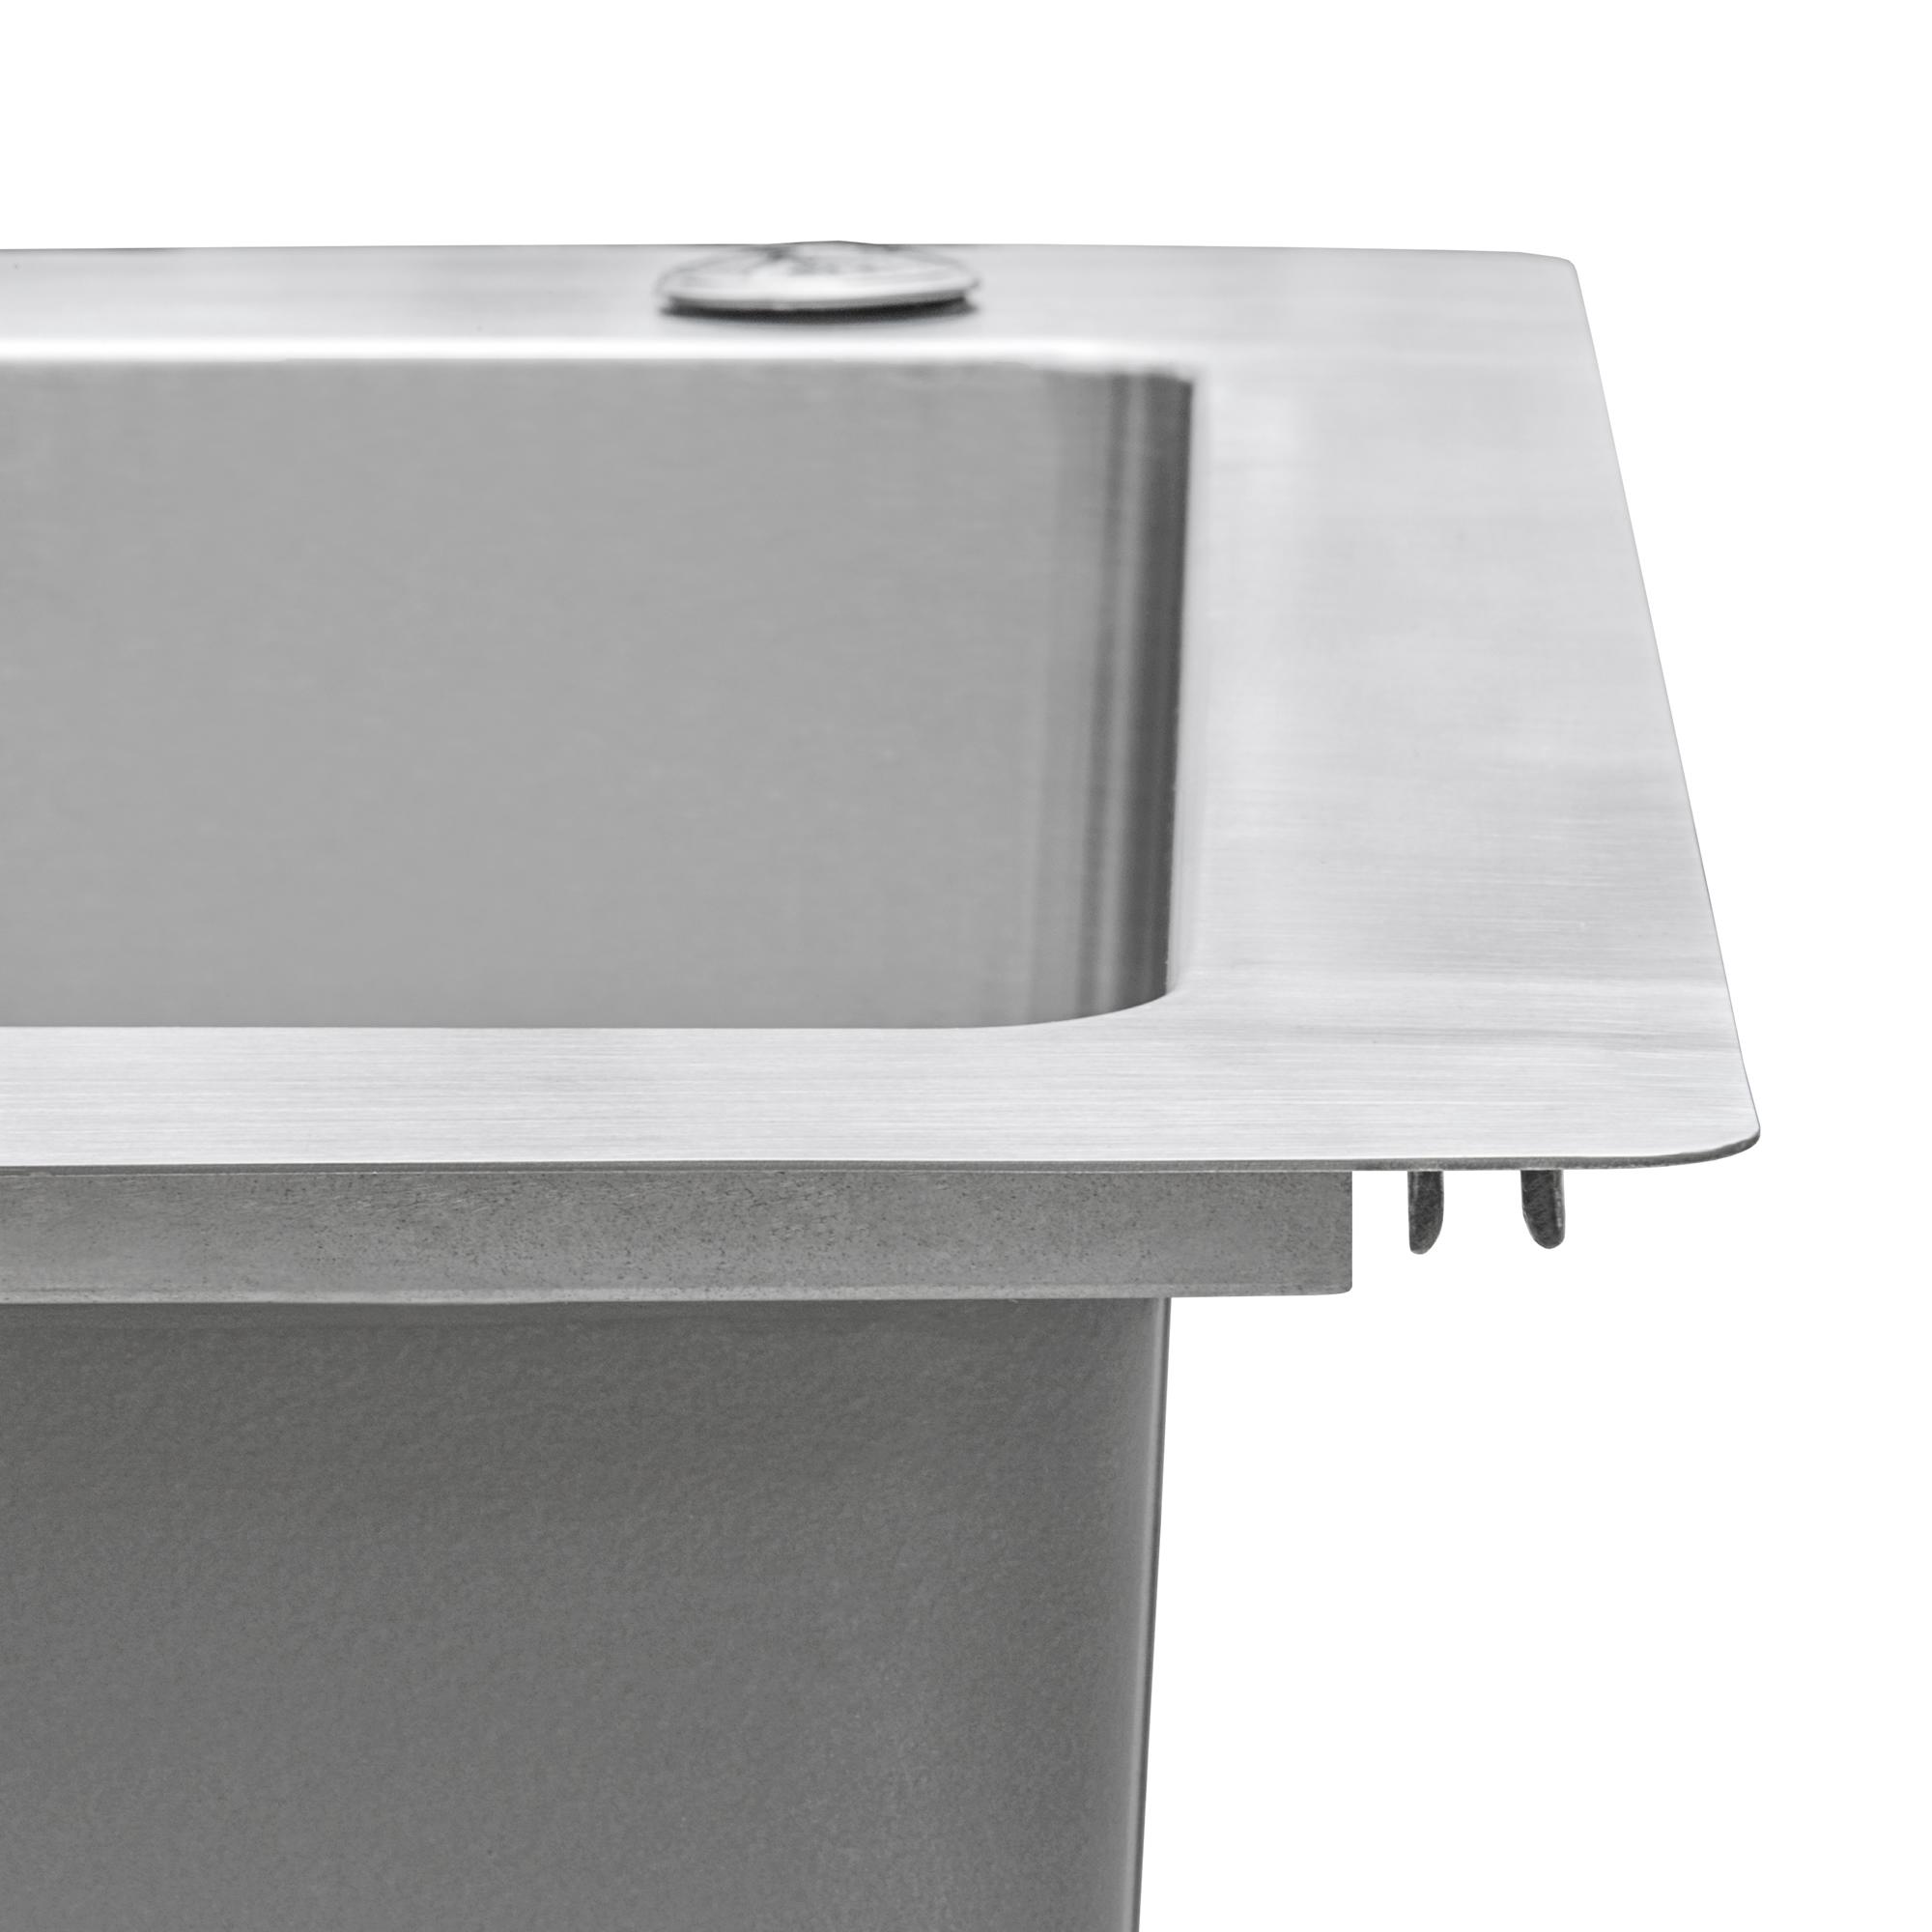 Ruvati 33 X 22 Inch Drop In Topmount Kitchen Sink 16 Gauge Stainless Steel 70 30 Double Bowl Rvm5173